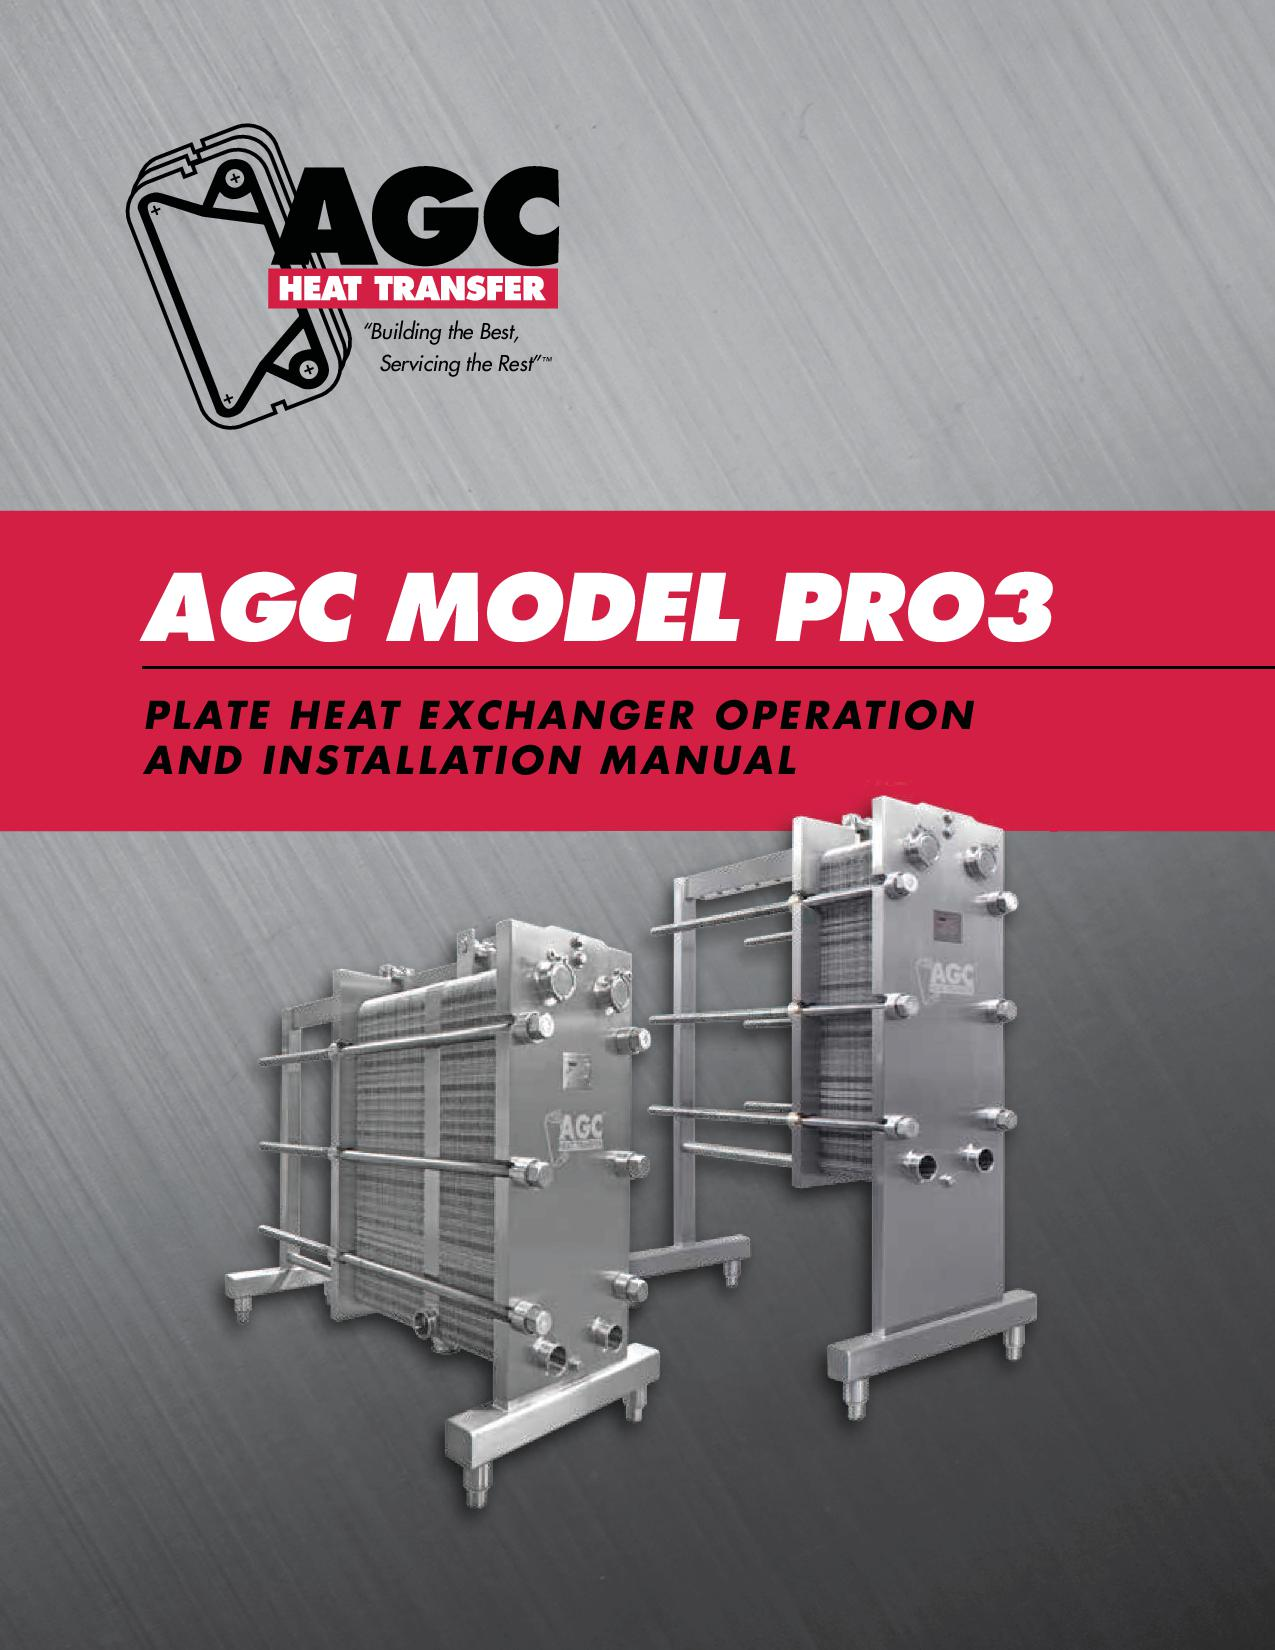 AGC Operating Manual Pro3